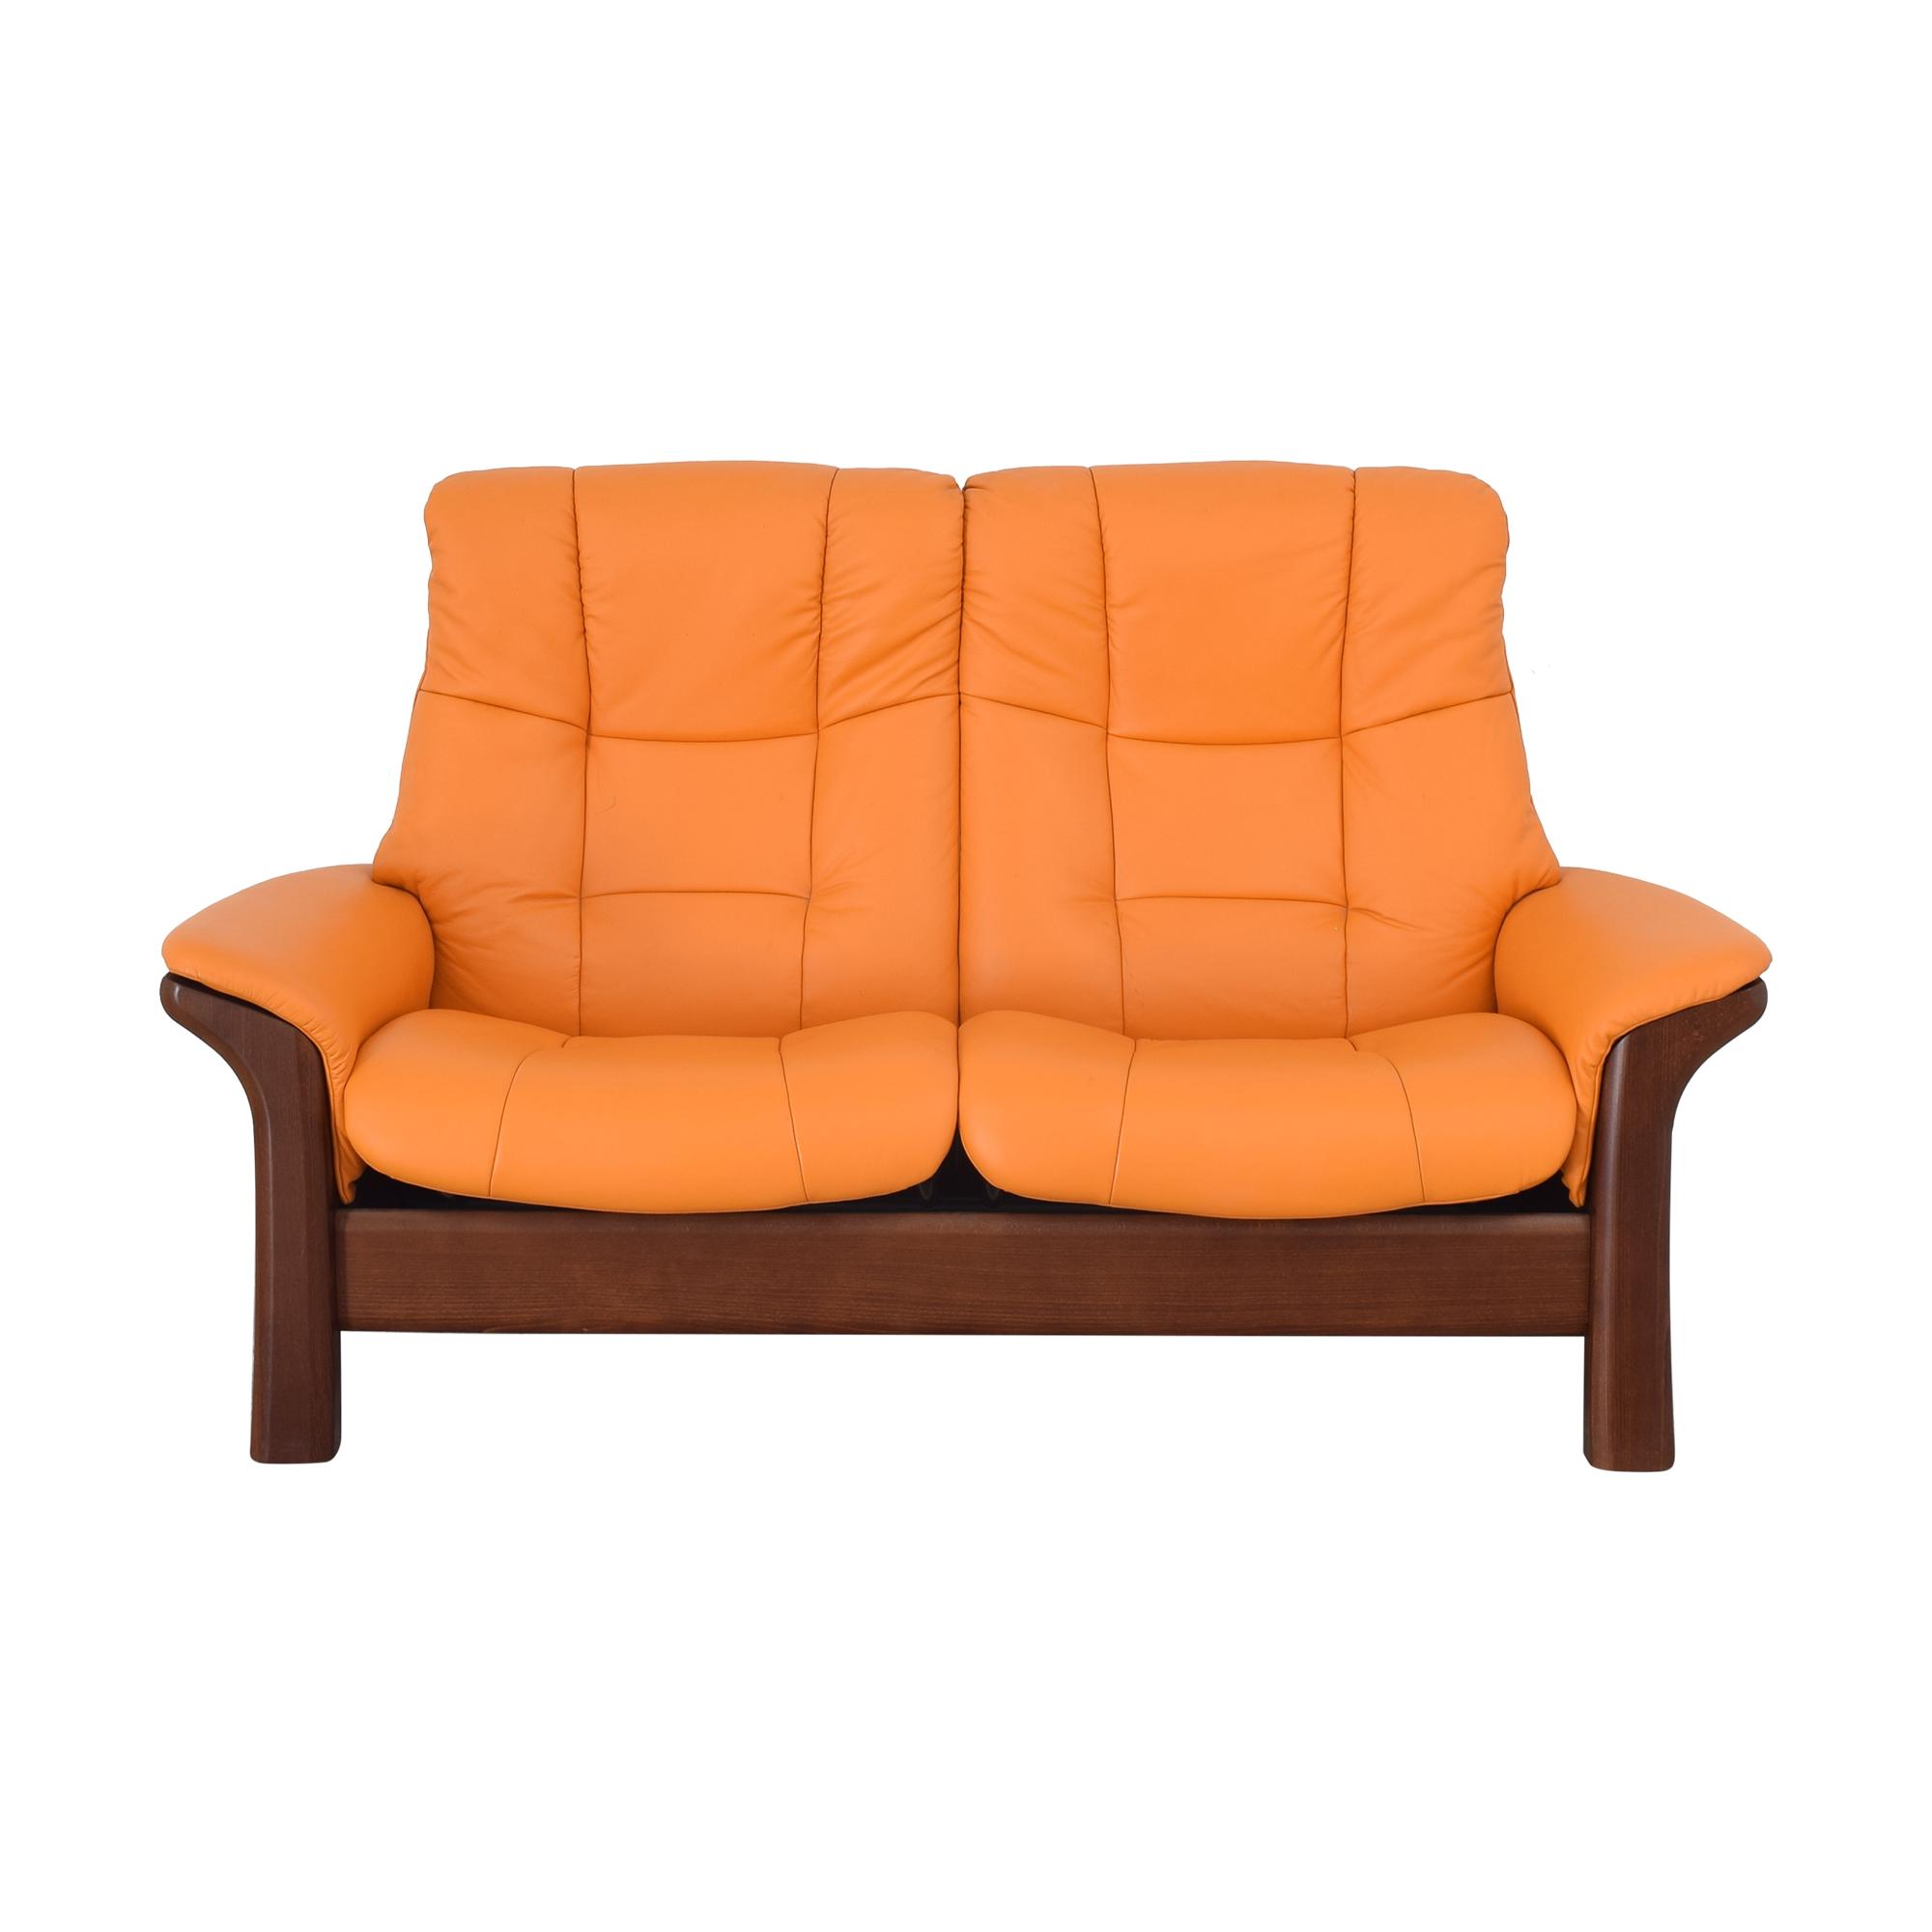 buy Ekornes Ekornes Stressless Buckingham High Back Two Seater online